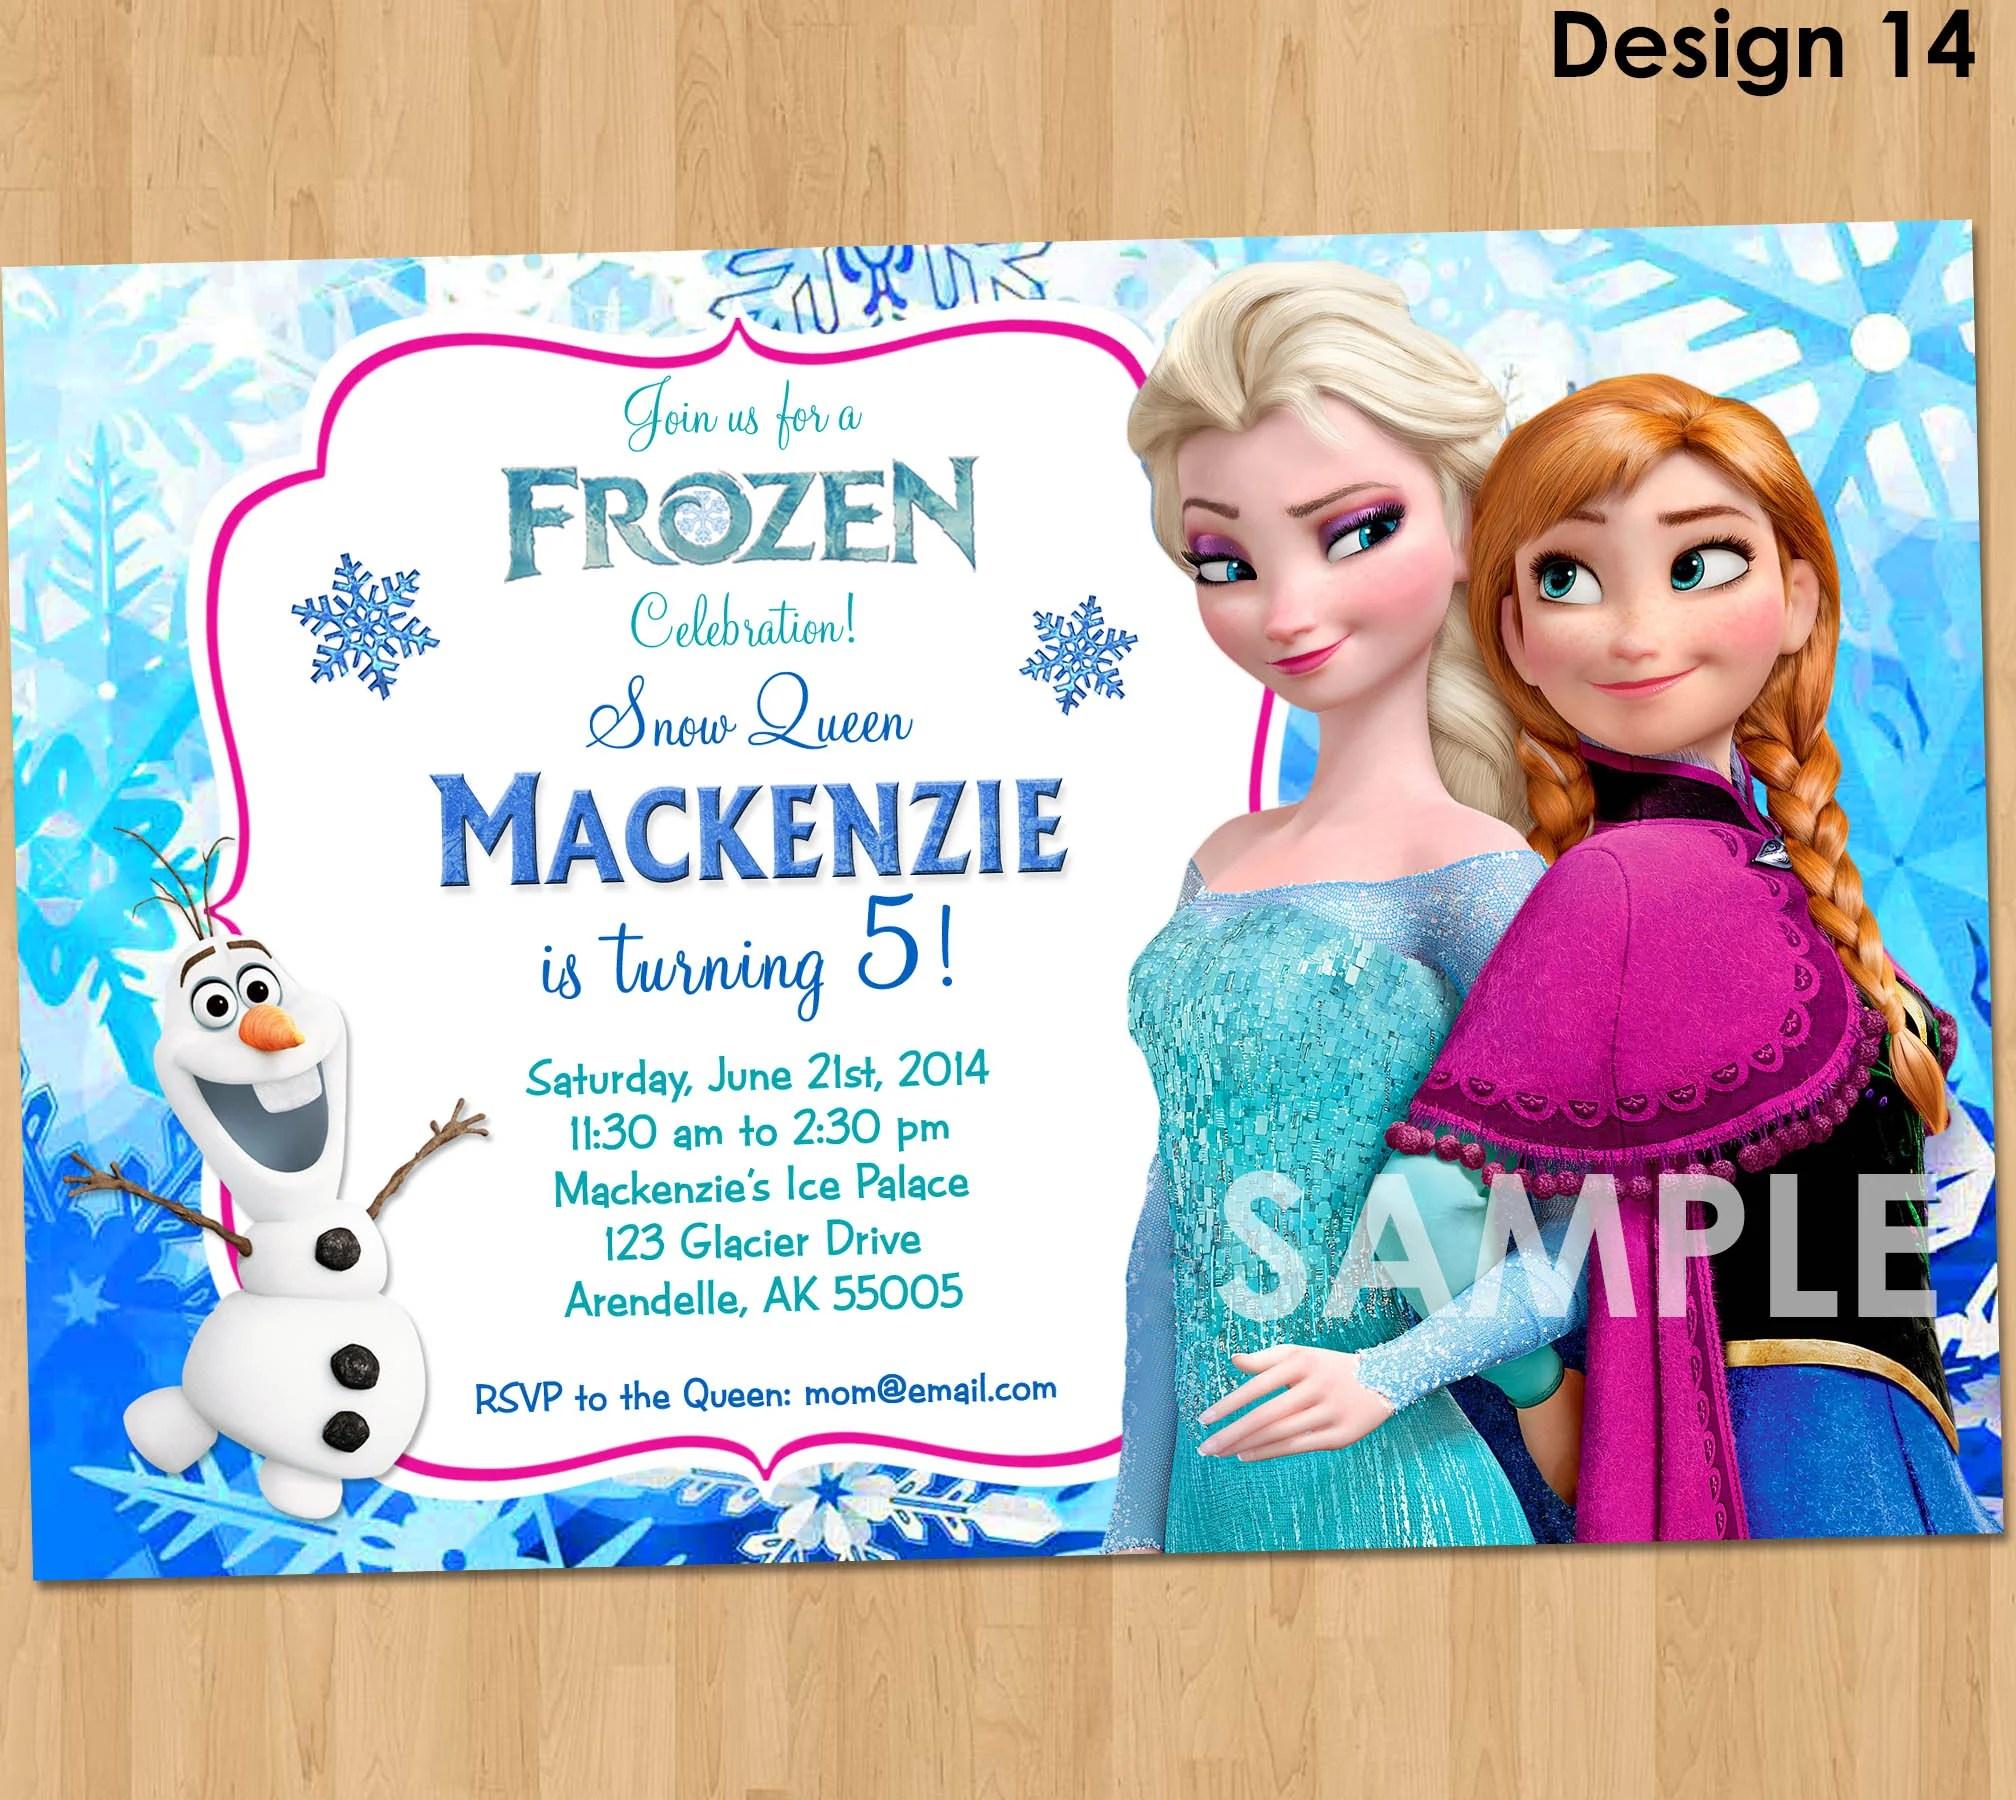 frozen invitation frozen birthday invitation disney frozen party invites birthday party ideas printable elsa anna olaf